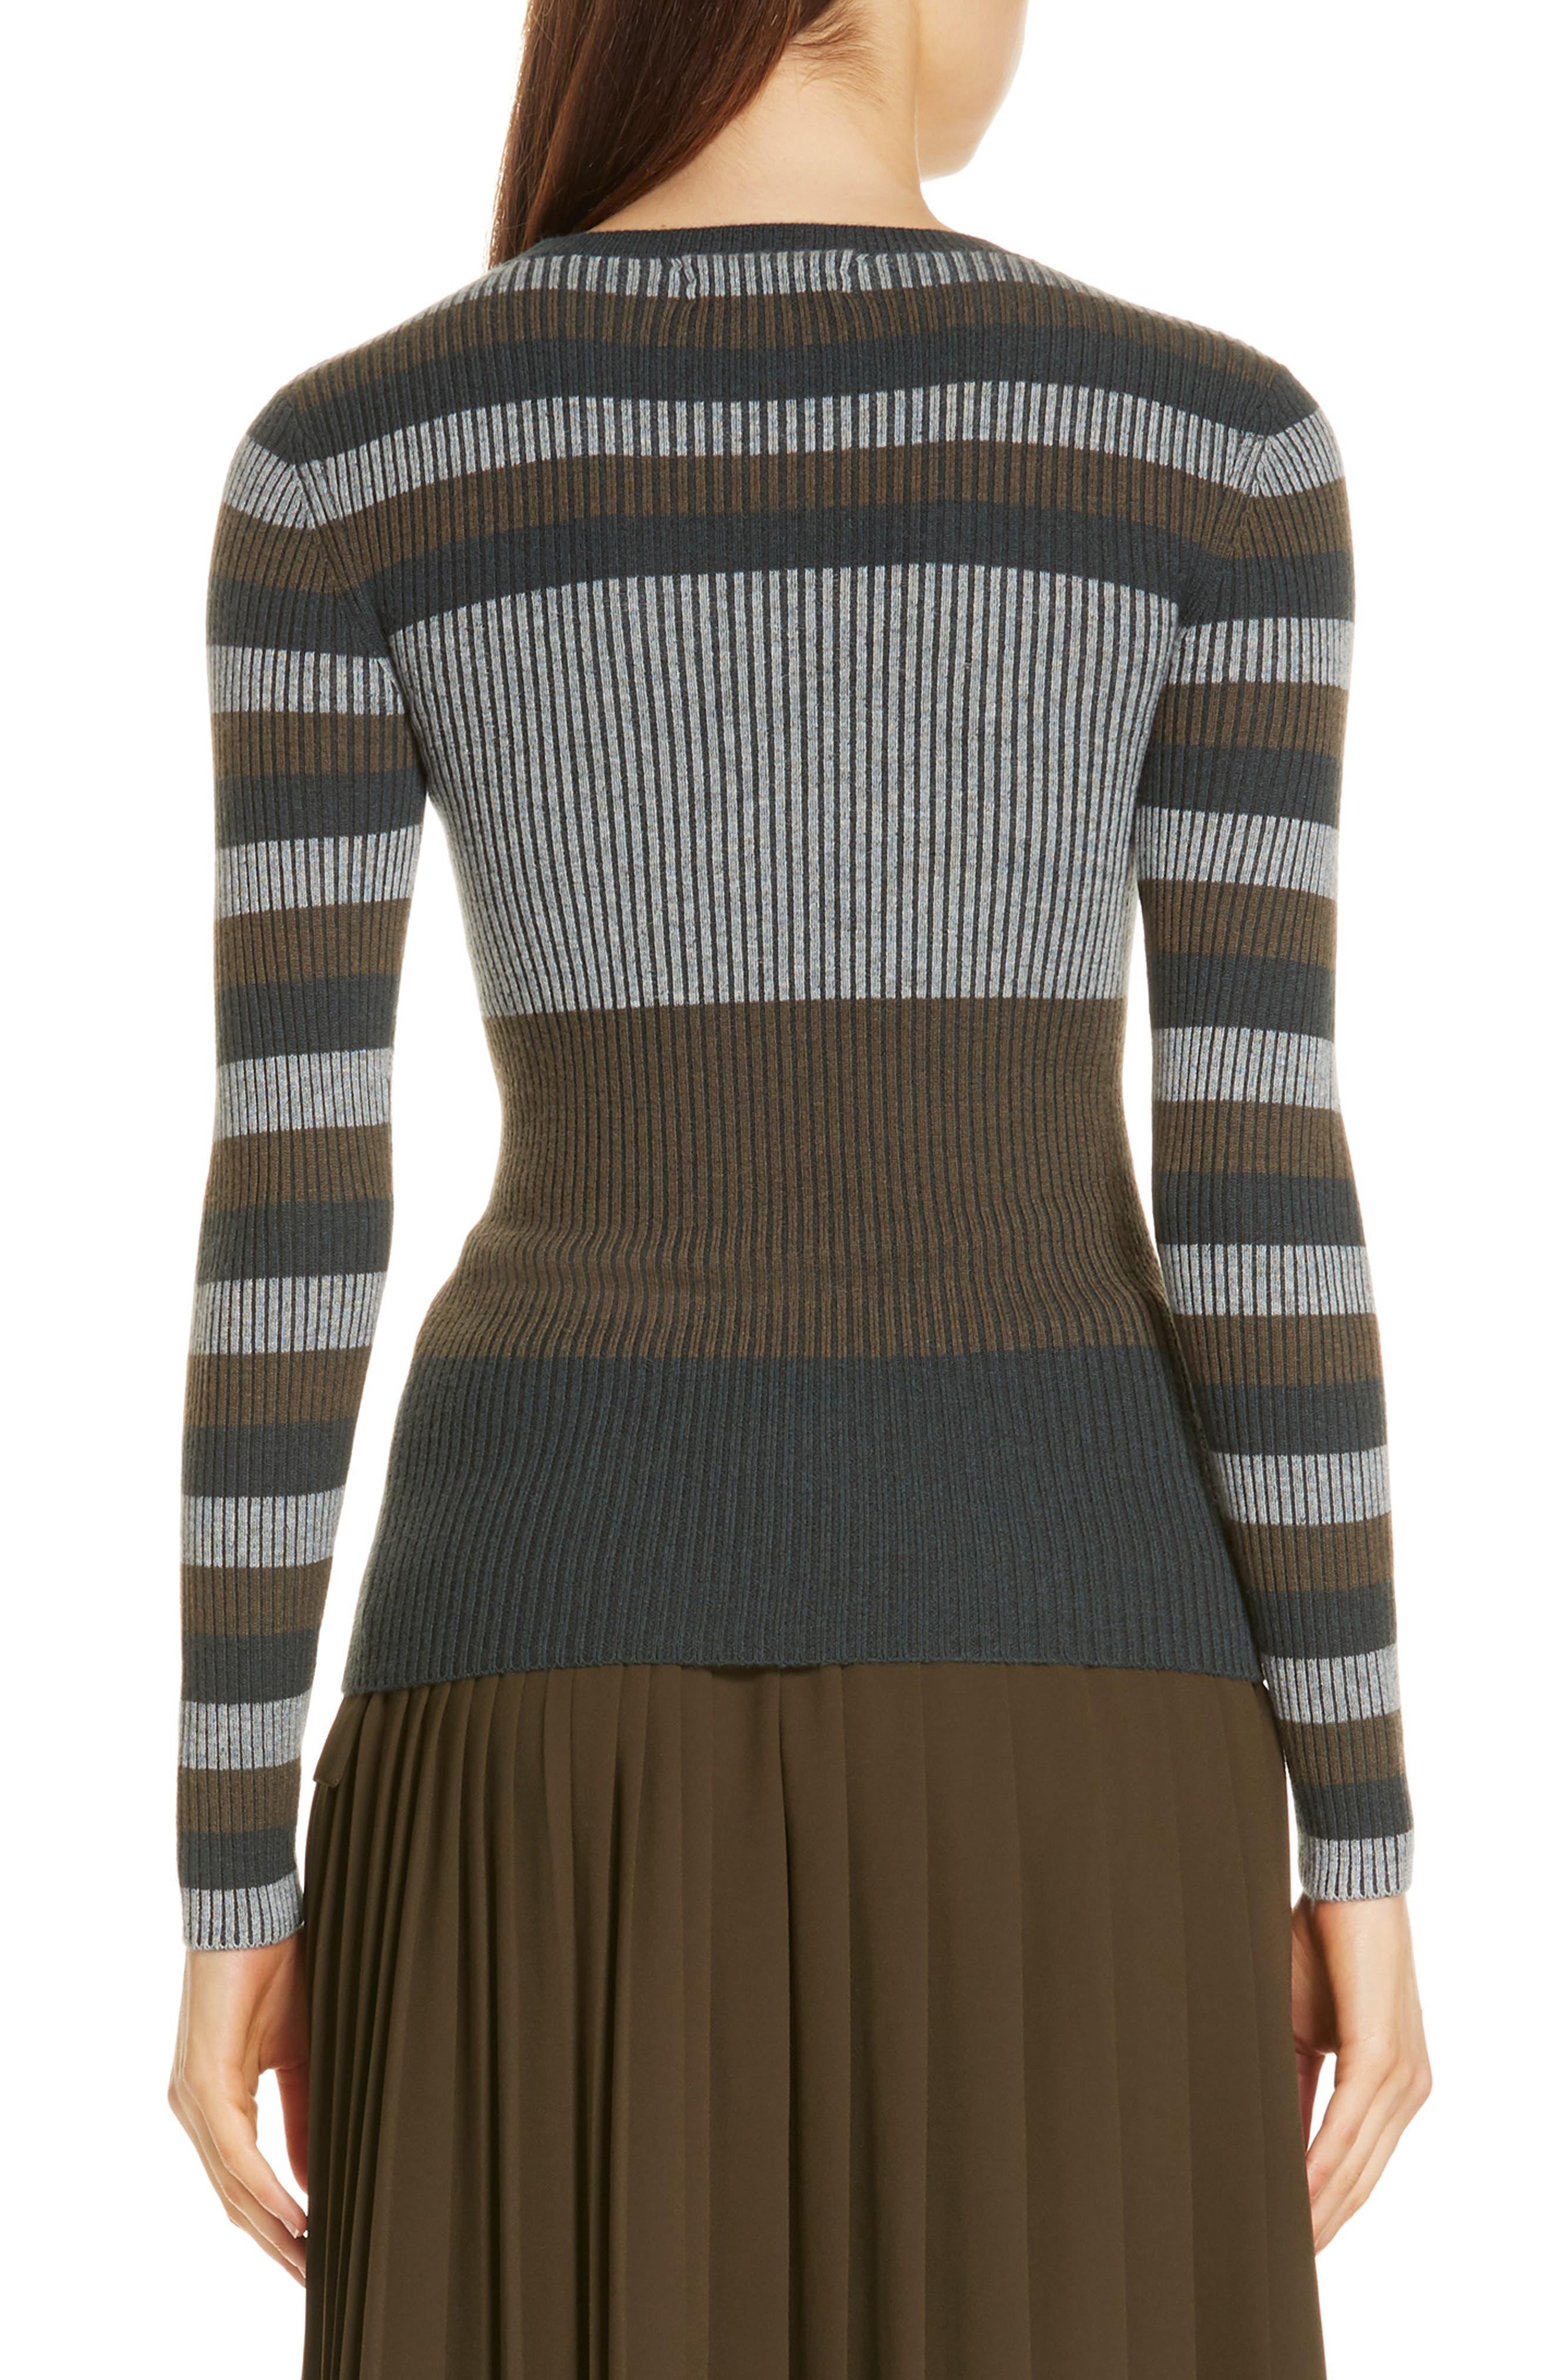 NORDSTROM SIGNATURE,                             Stripe Cashmere Sweater,                             Alternate thumbnail 2, color,                             315